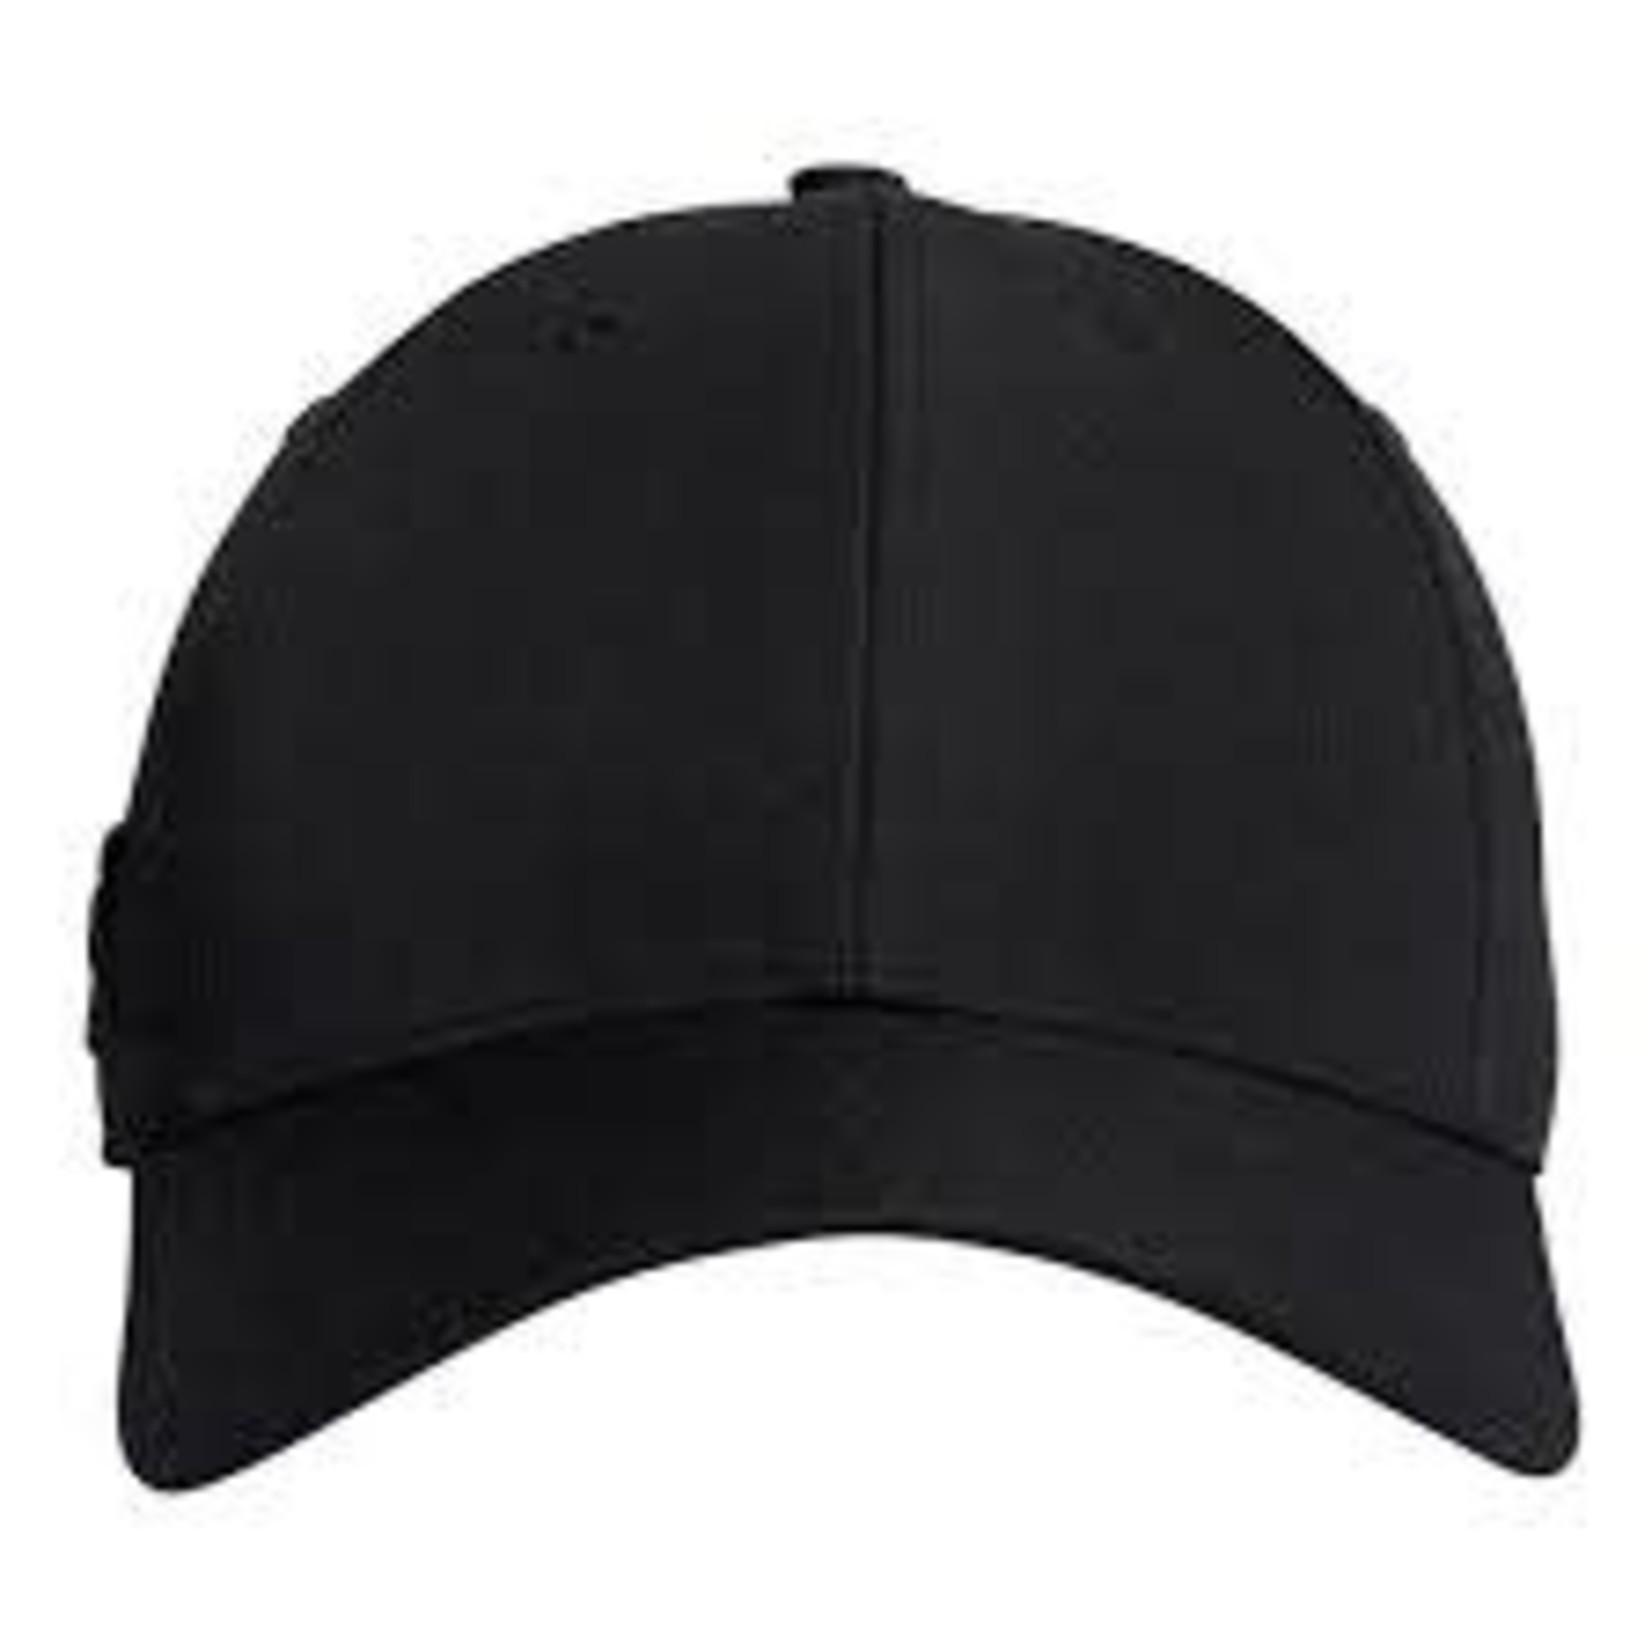 Adidas PE Hat (Blank)